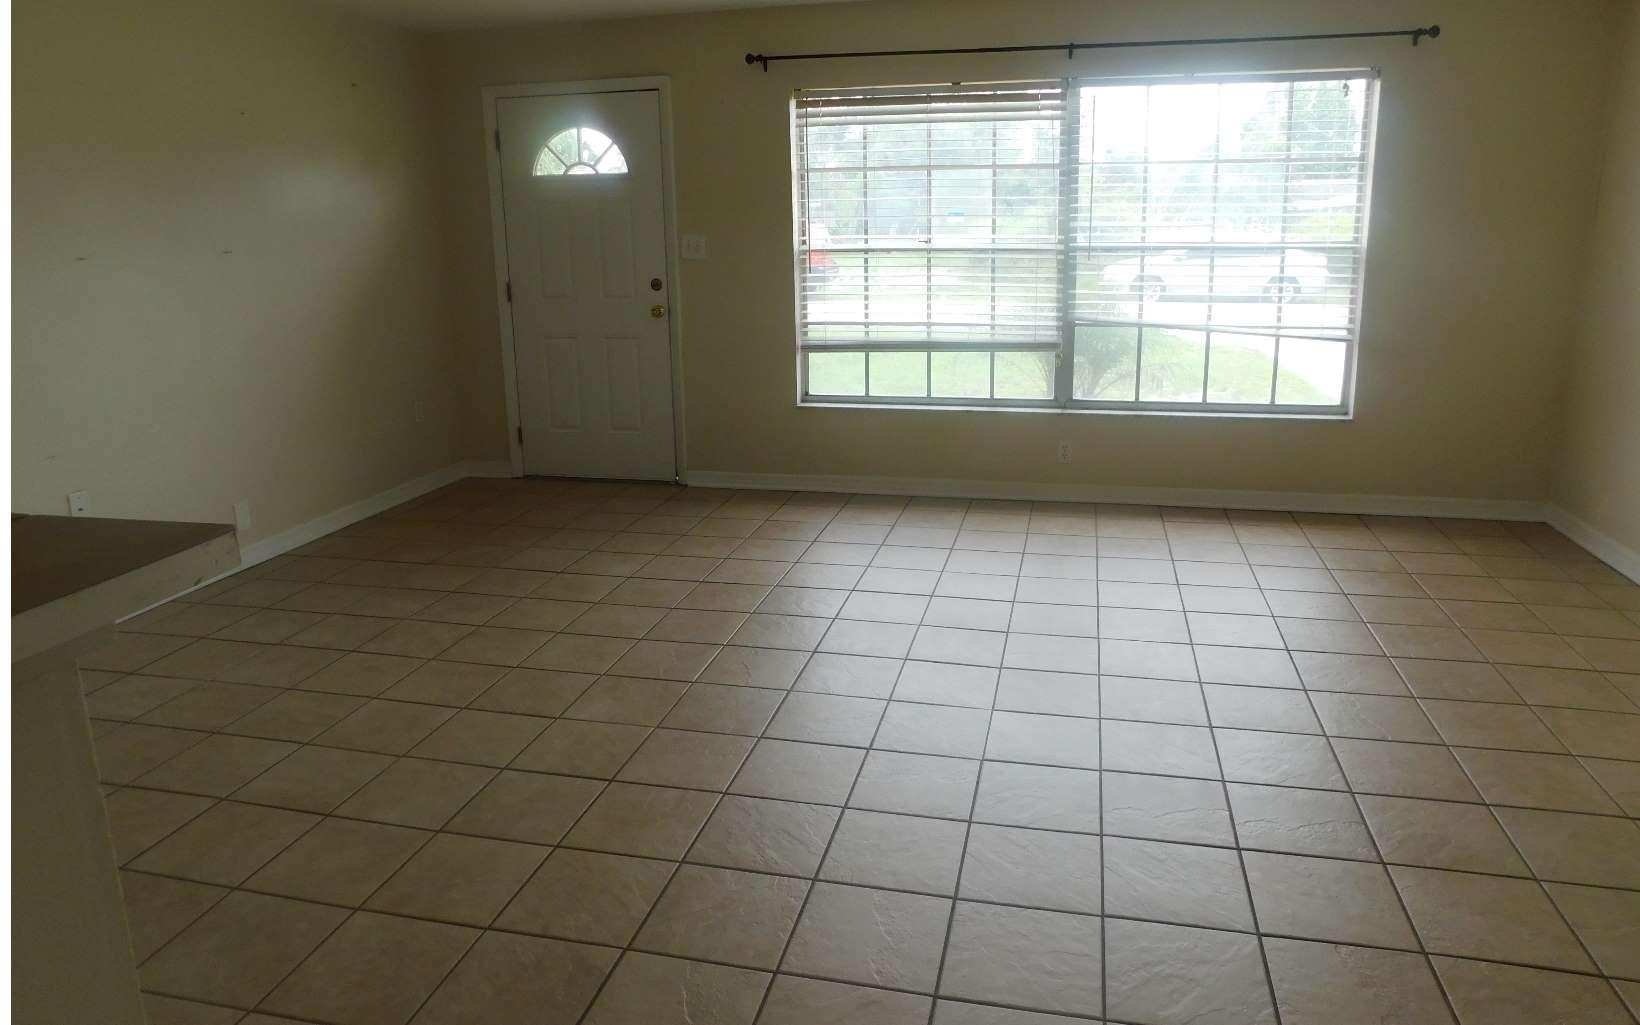 257 Cumquat Rd Nw, Lake Placid, FL 33852